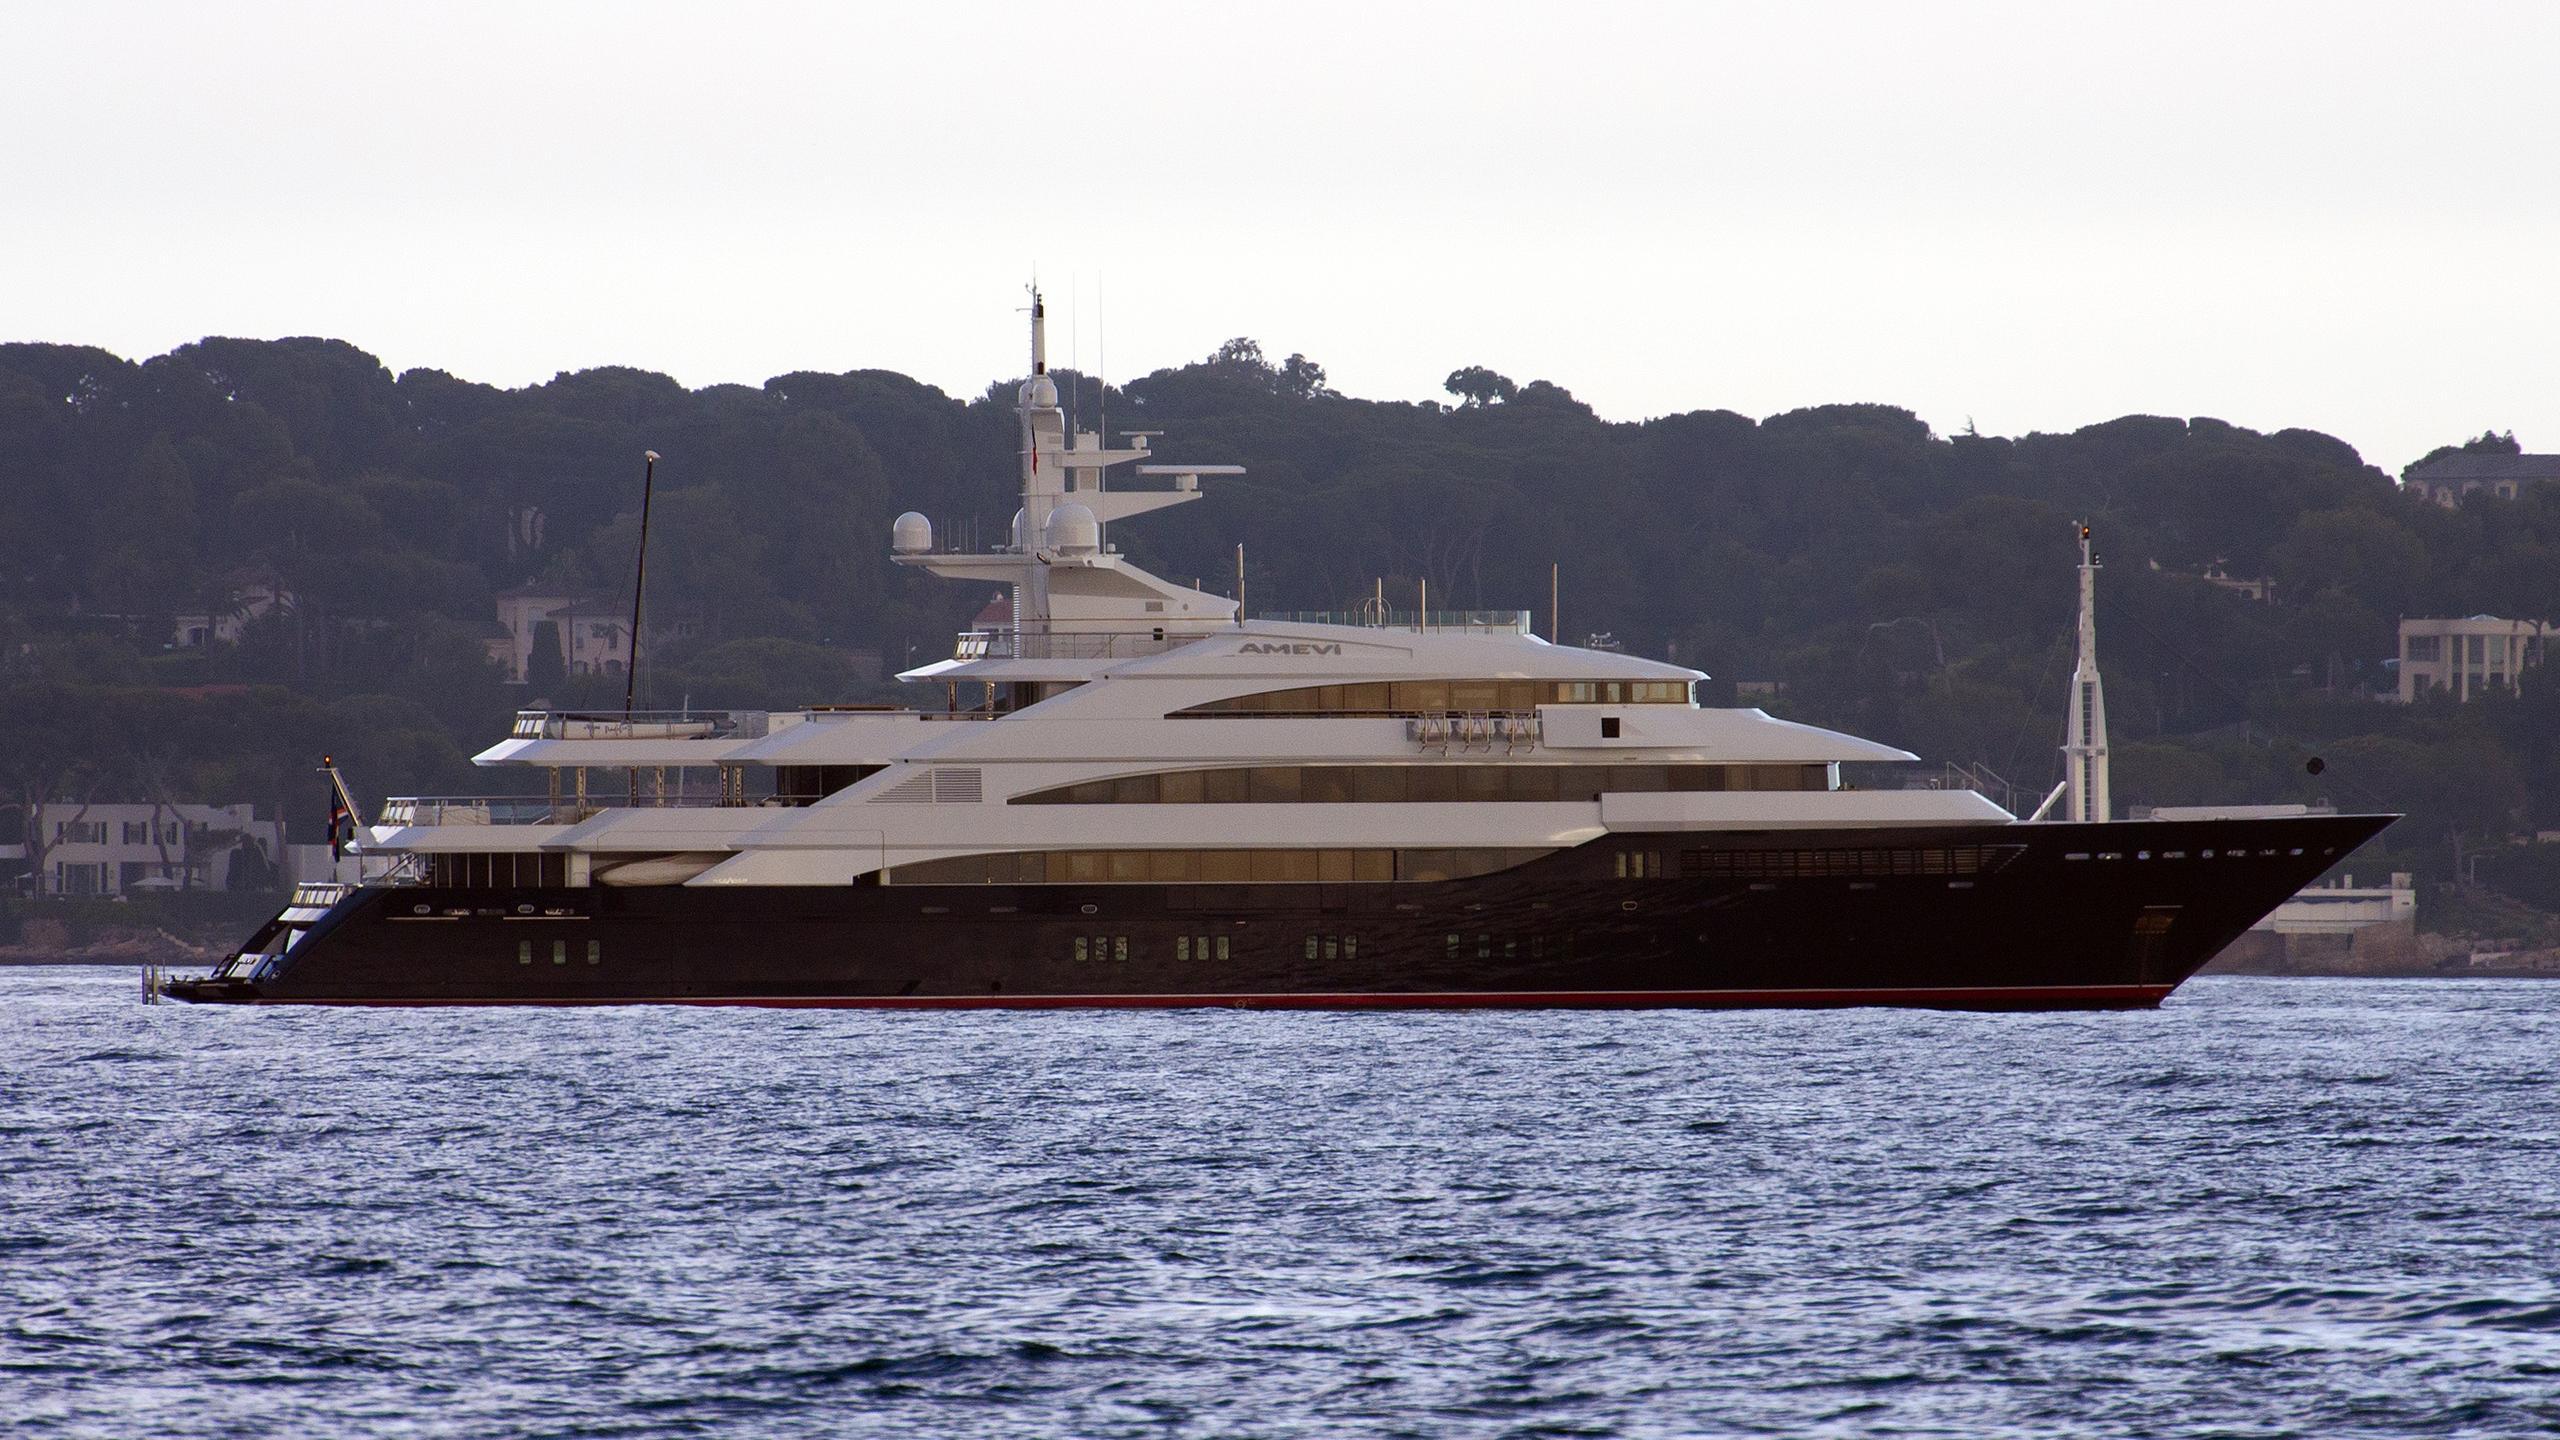 amevi-motoryacht-oceanco-2007-80m-profile